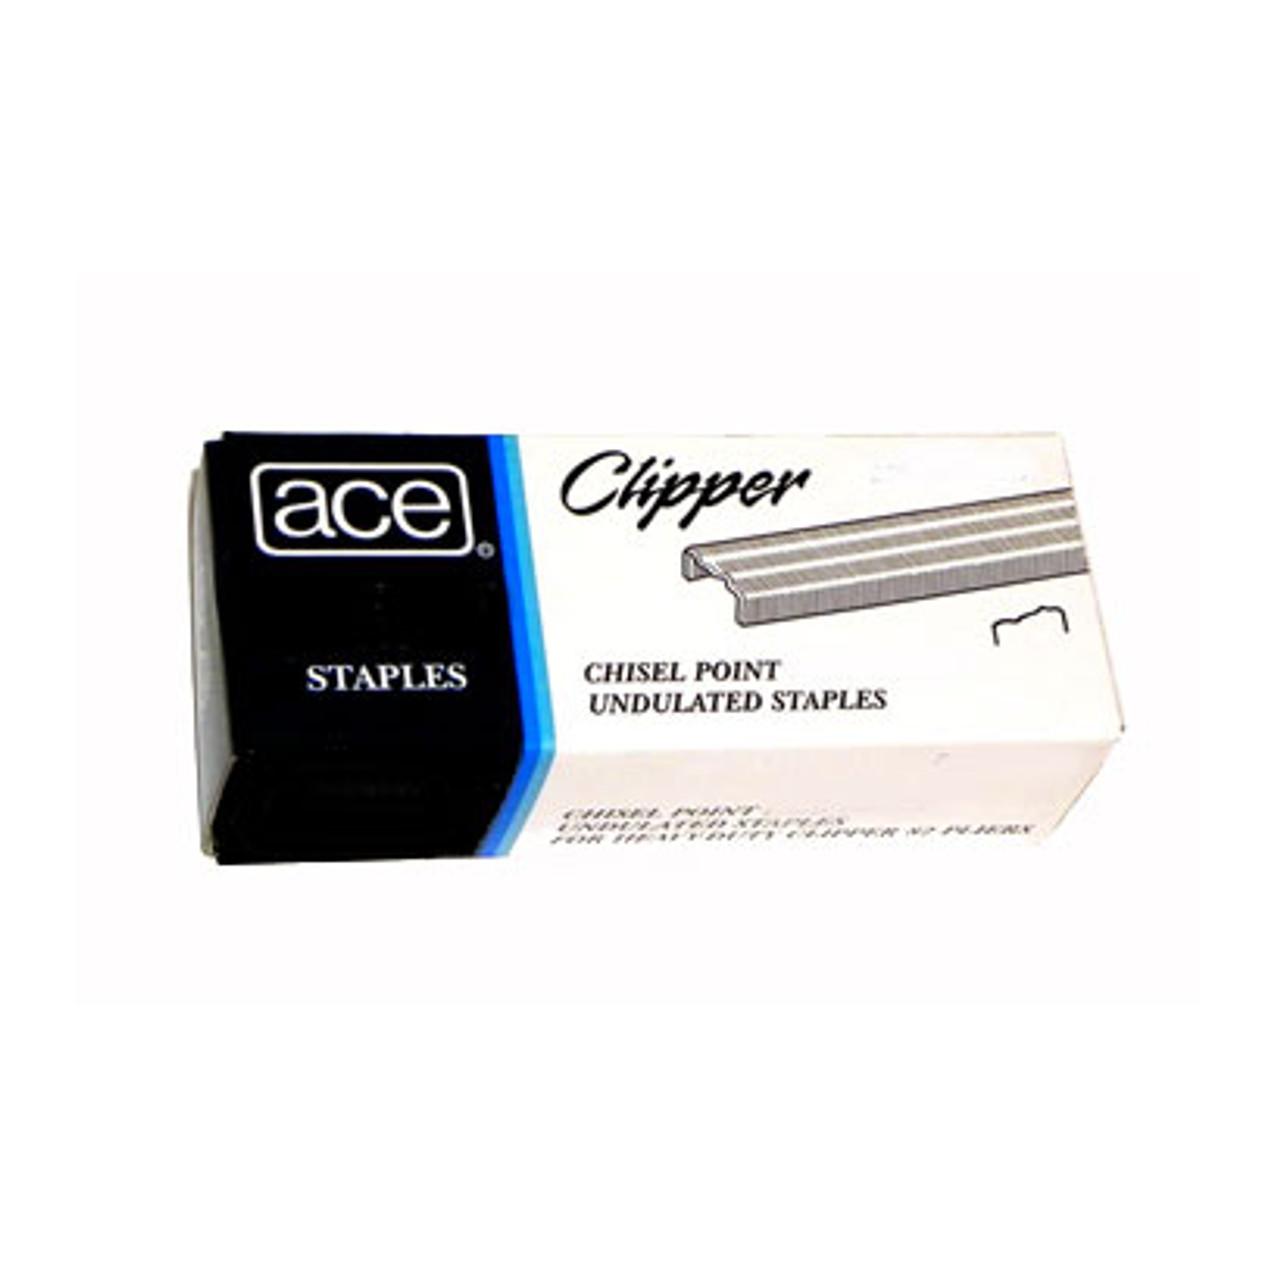 Ace #70001 Staples